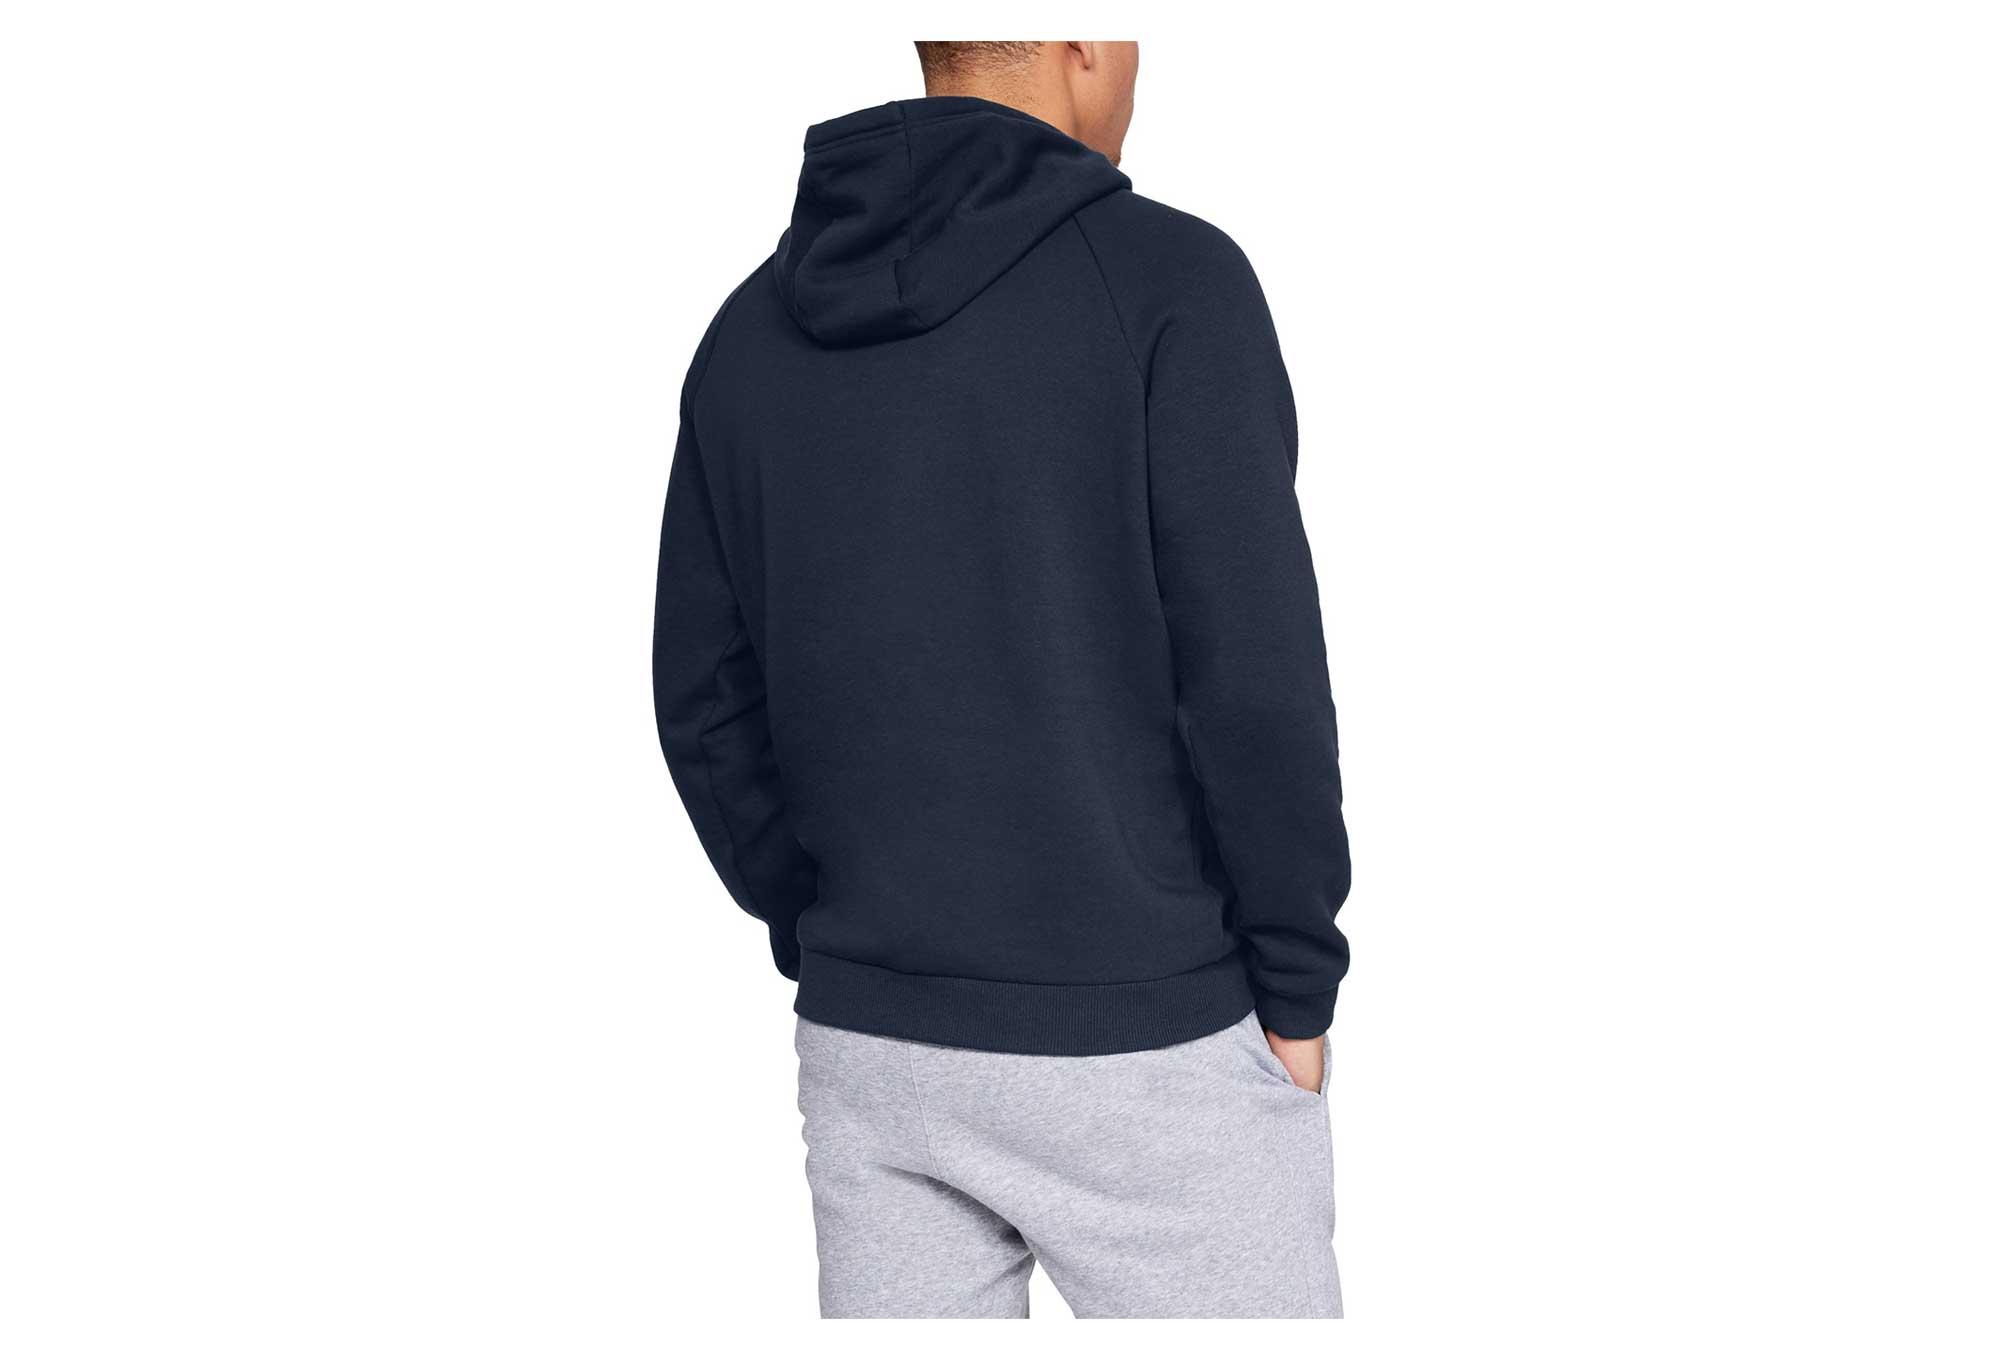 Under Armour Rival Fleece Logo Hoodie Sweat Navy Blue